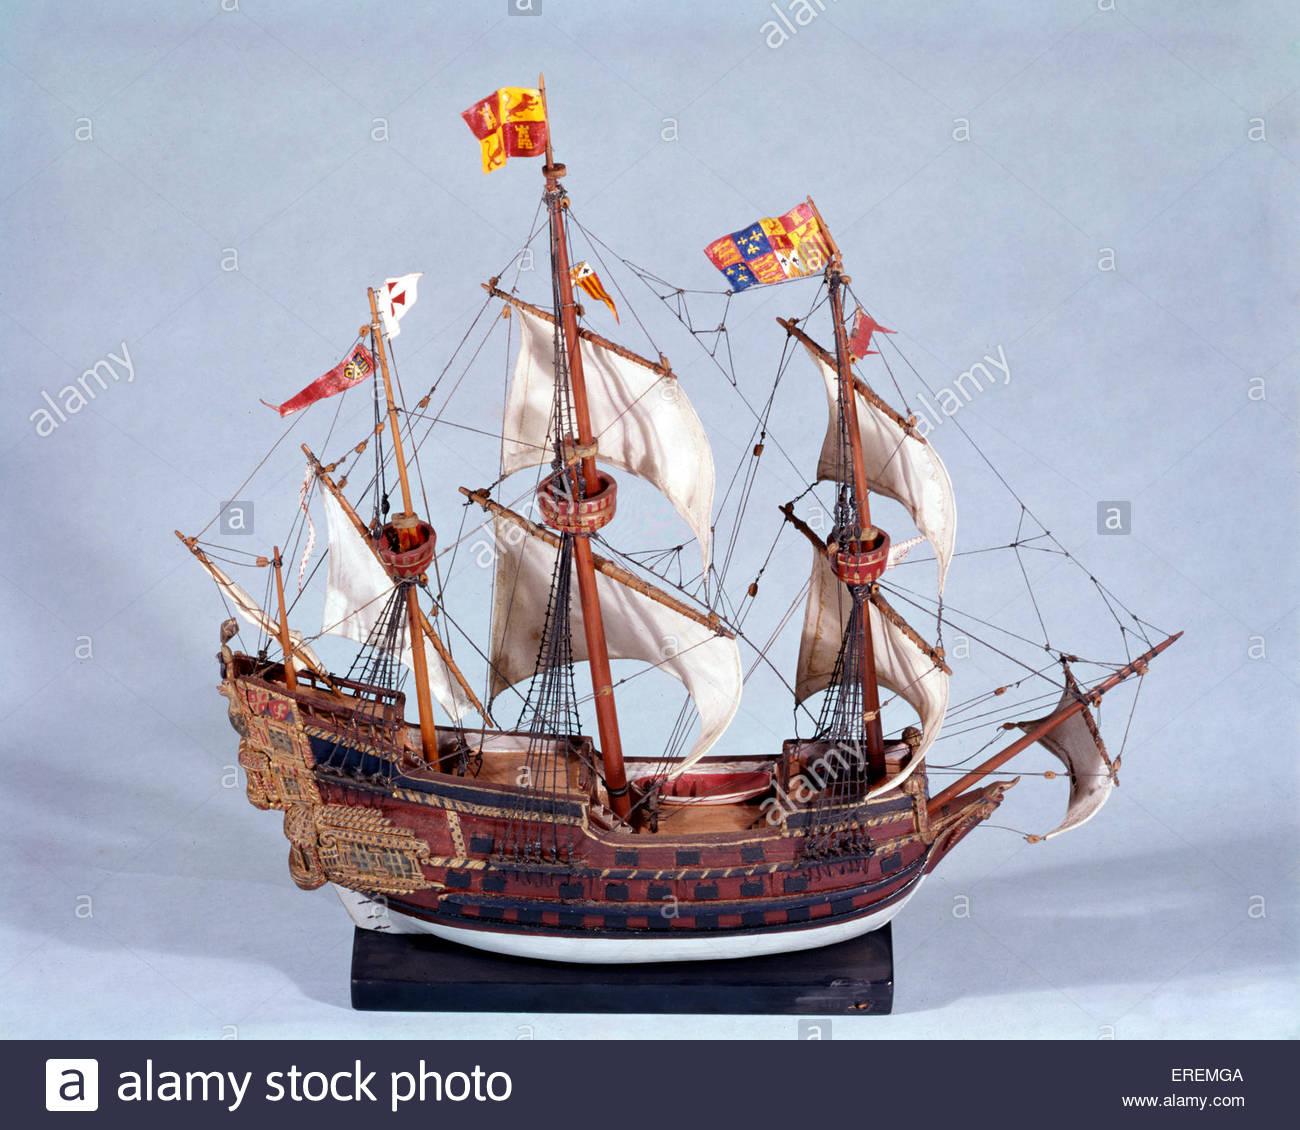 spanish galleon san martino model of flagship of the spanish